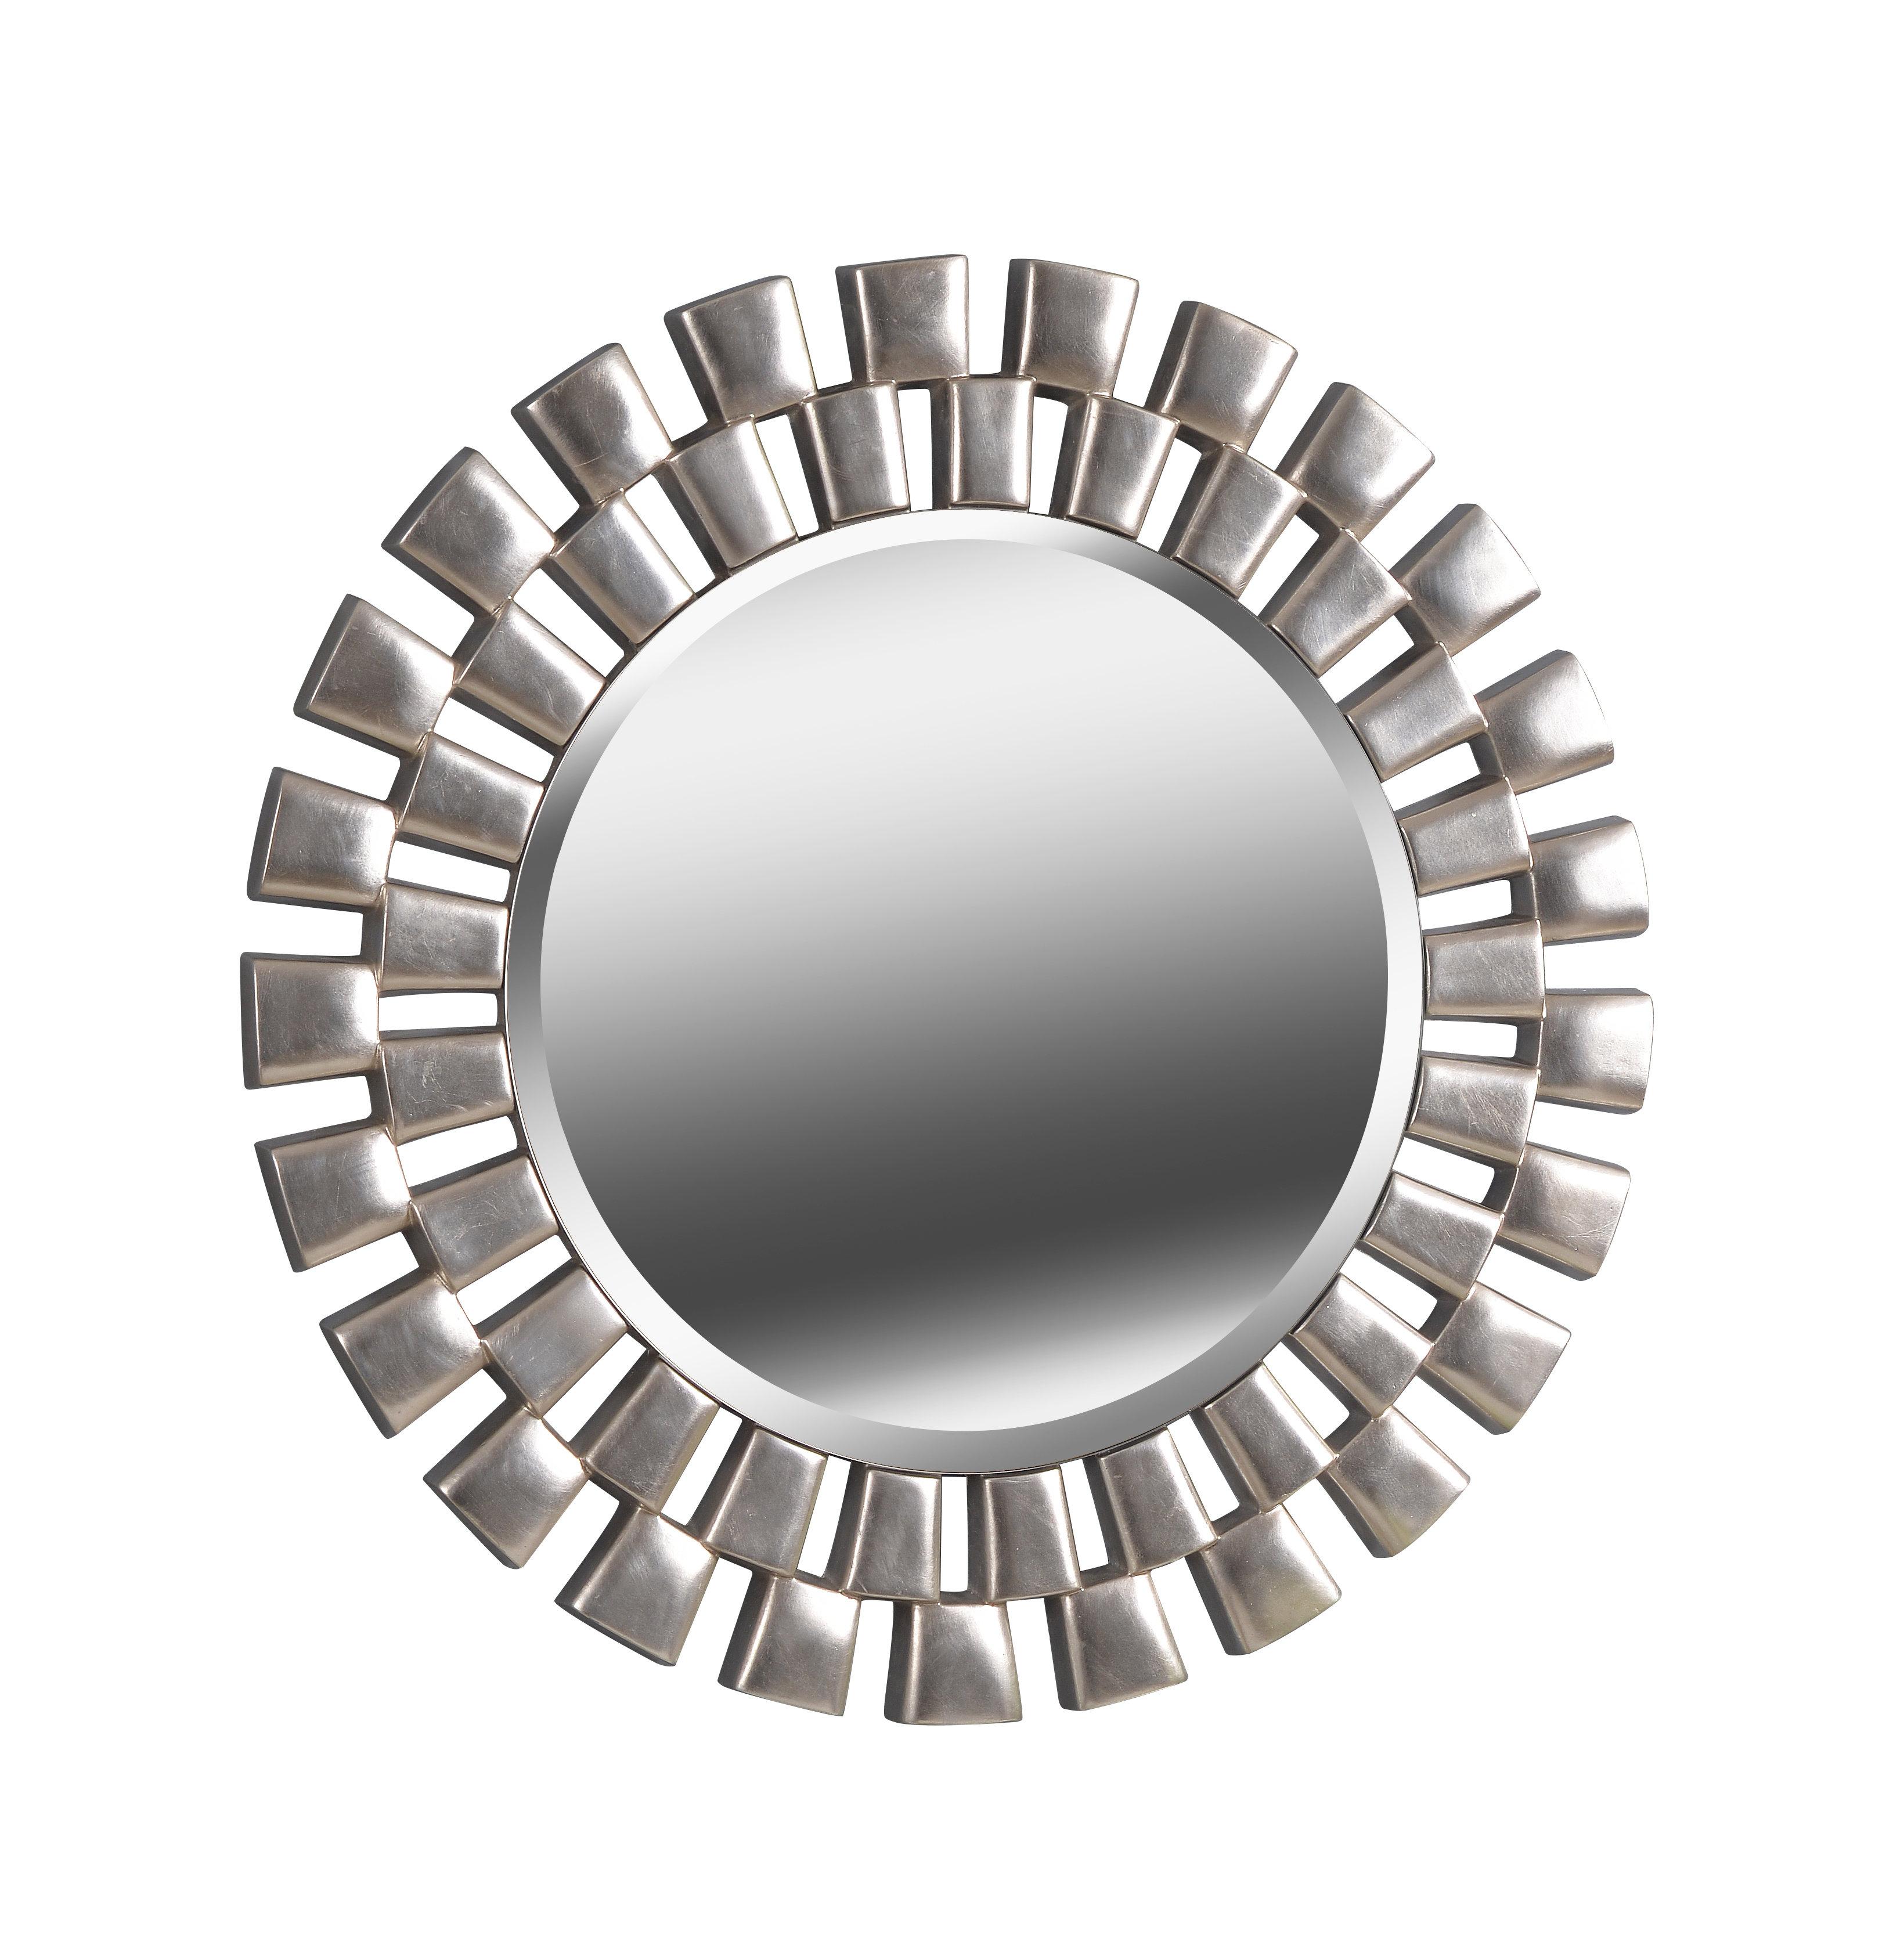 Glam Beveled Accent Mirror Pertaining To Tata Openwork Round Wall Mirrors (View 17 of 30)